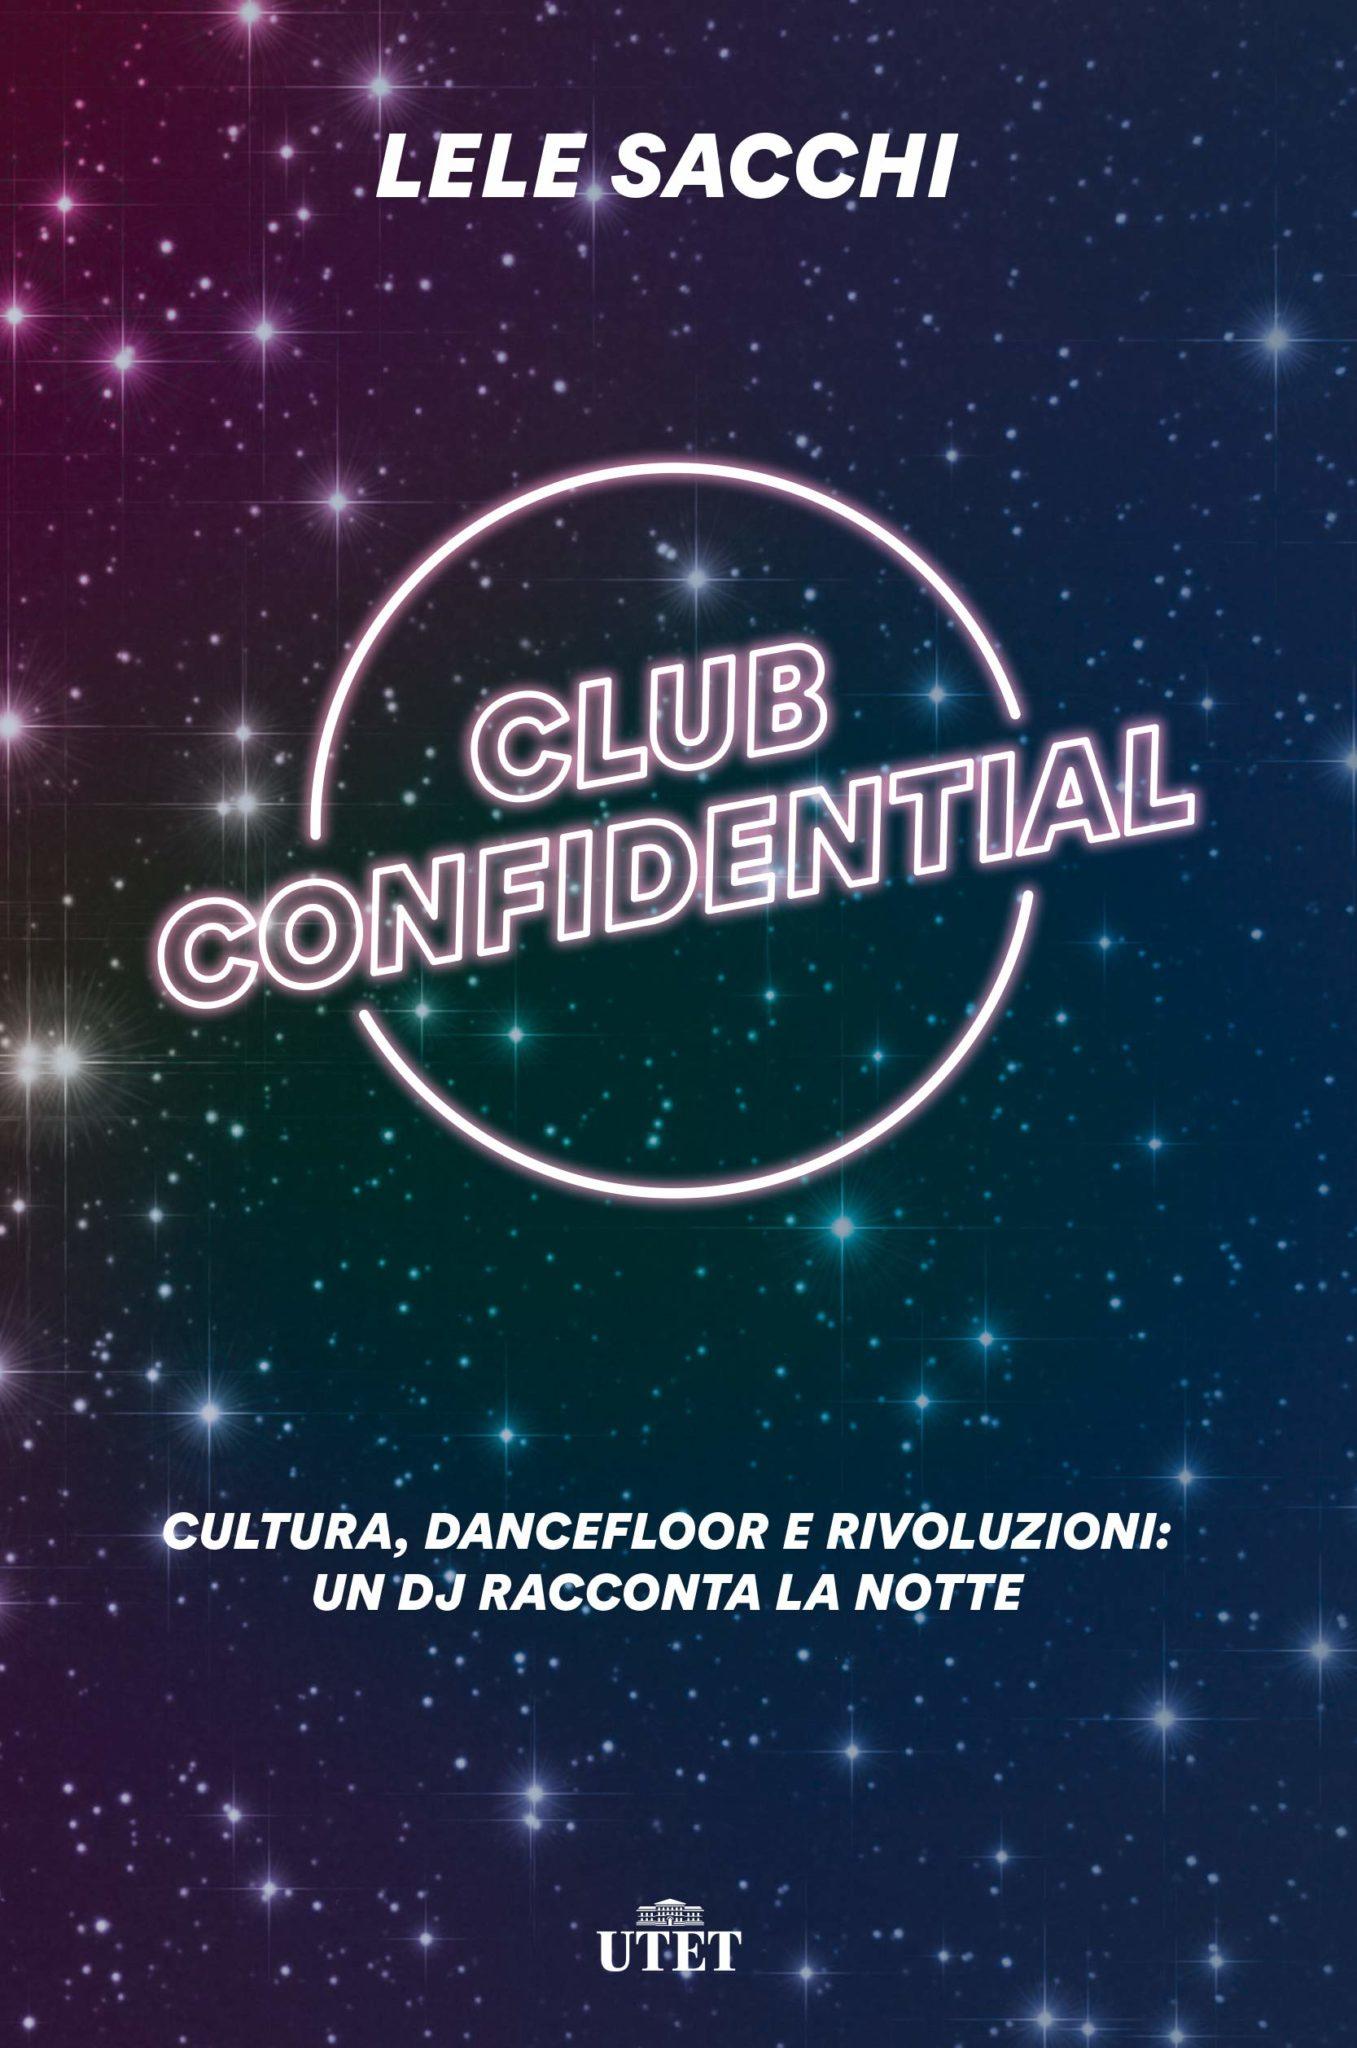 Recensione di Club Confidential – Lele Sacchi